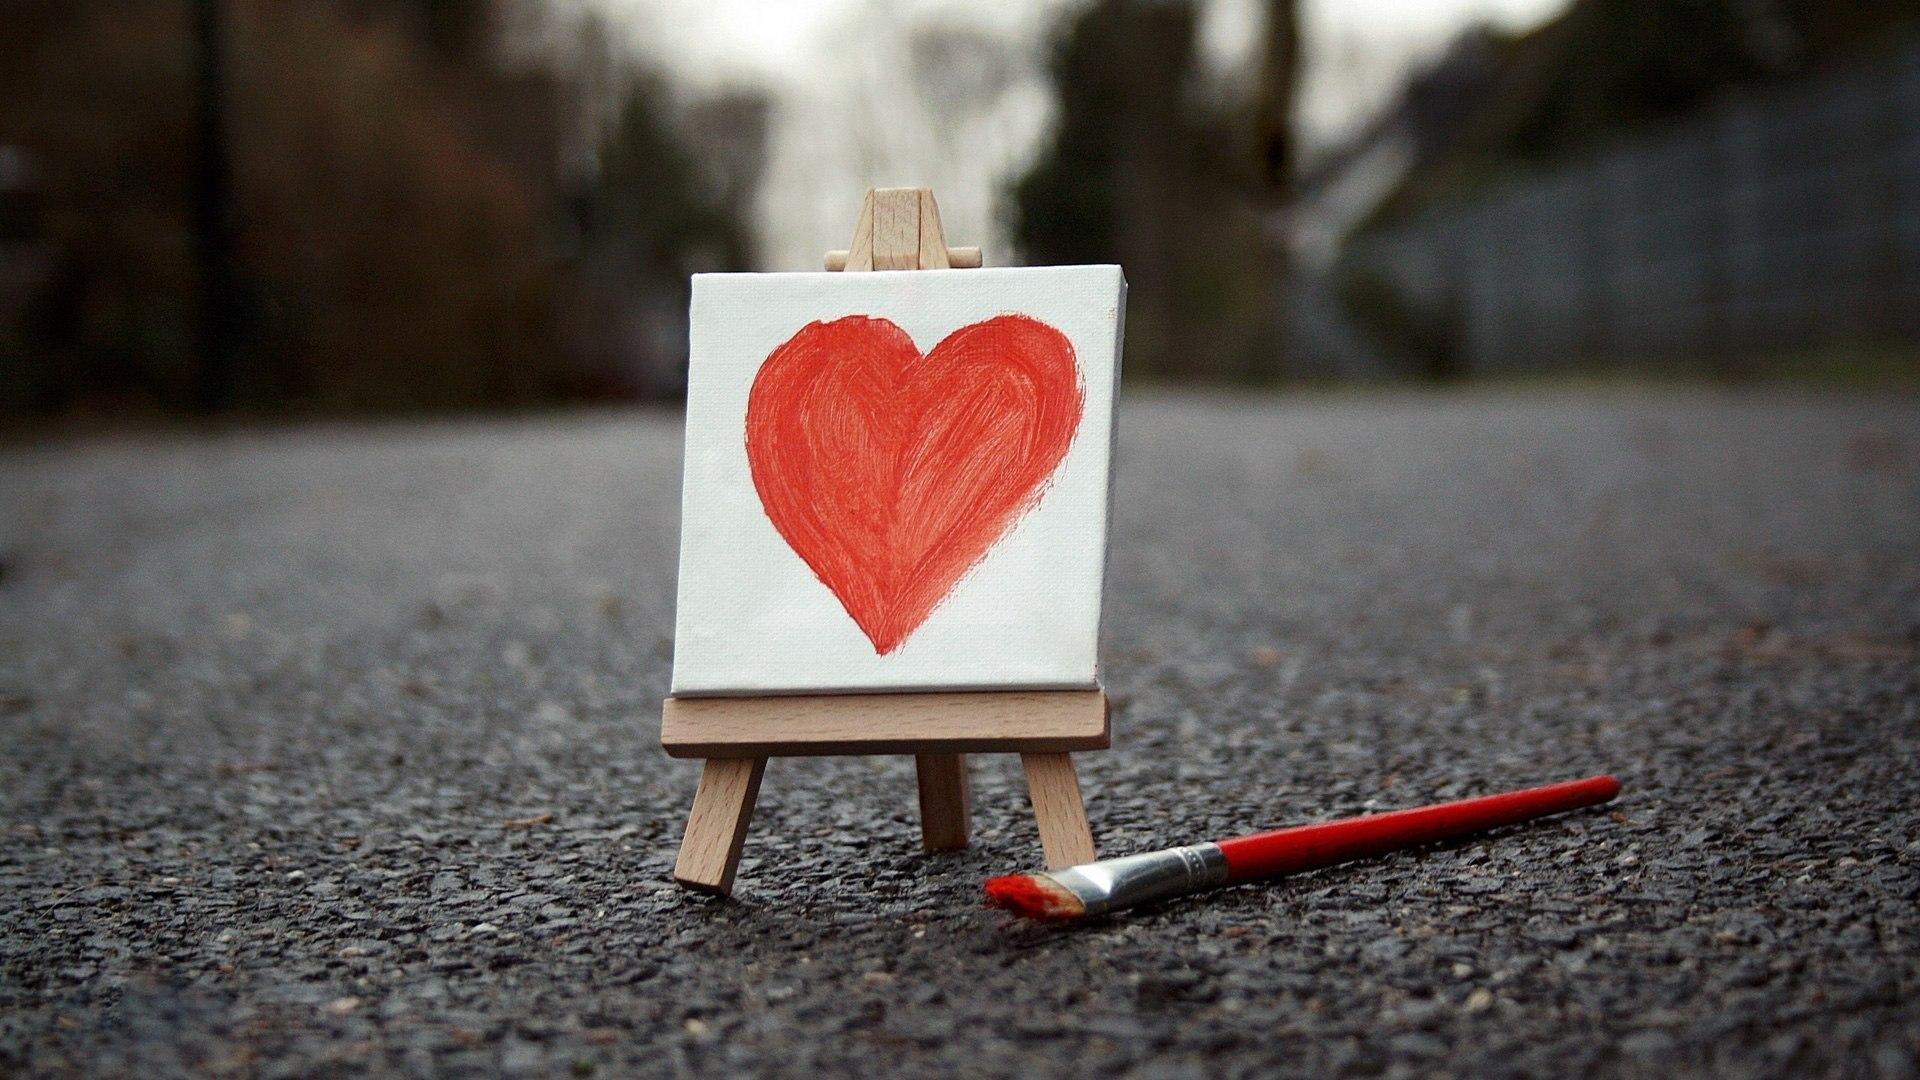 Love Art Wallpapers Top Free Love Art Backgrounds Wallpaperaccess